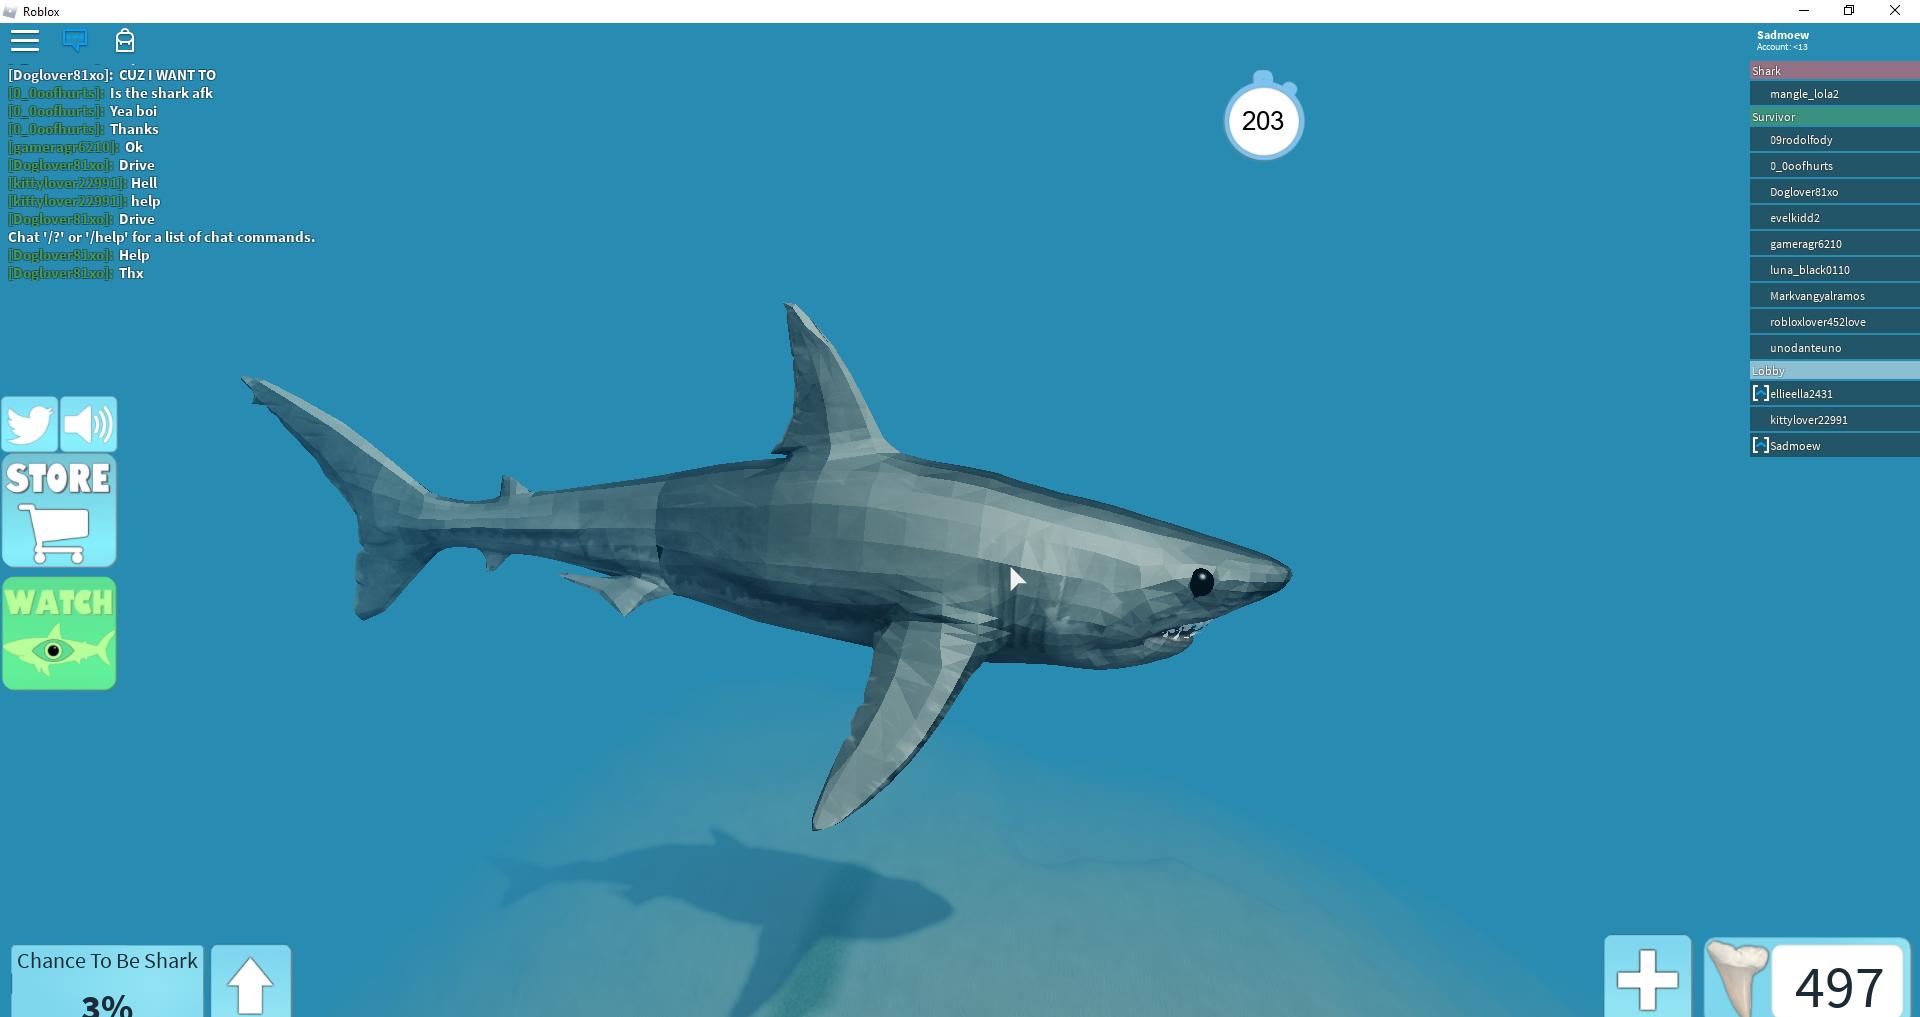 Shark Bite roblox | Random Roblox Games And more Wiki